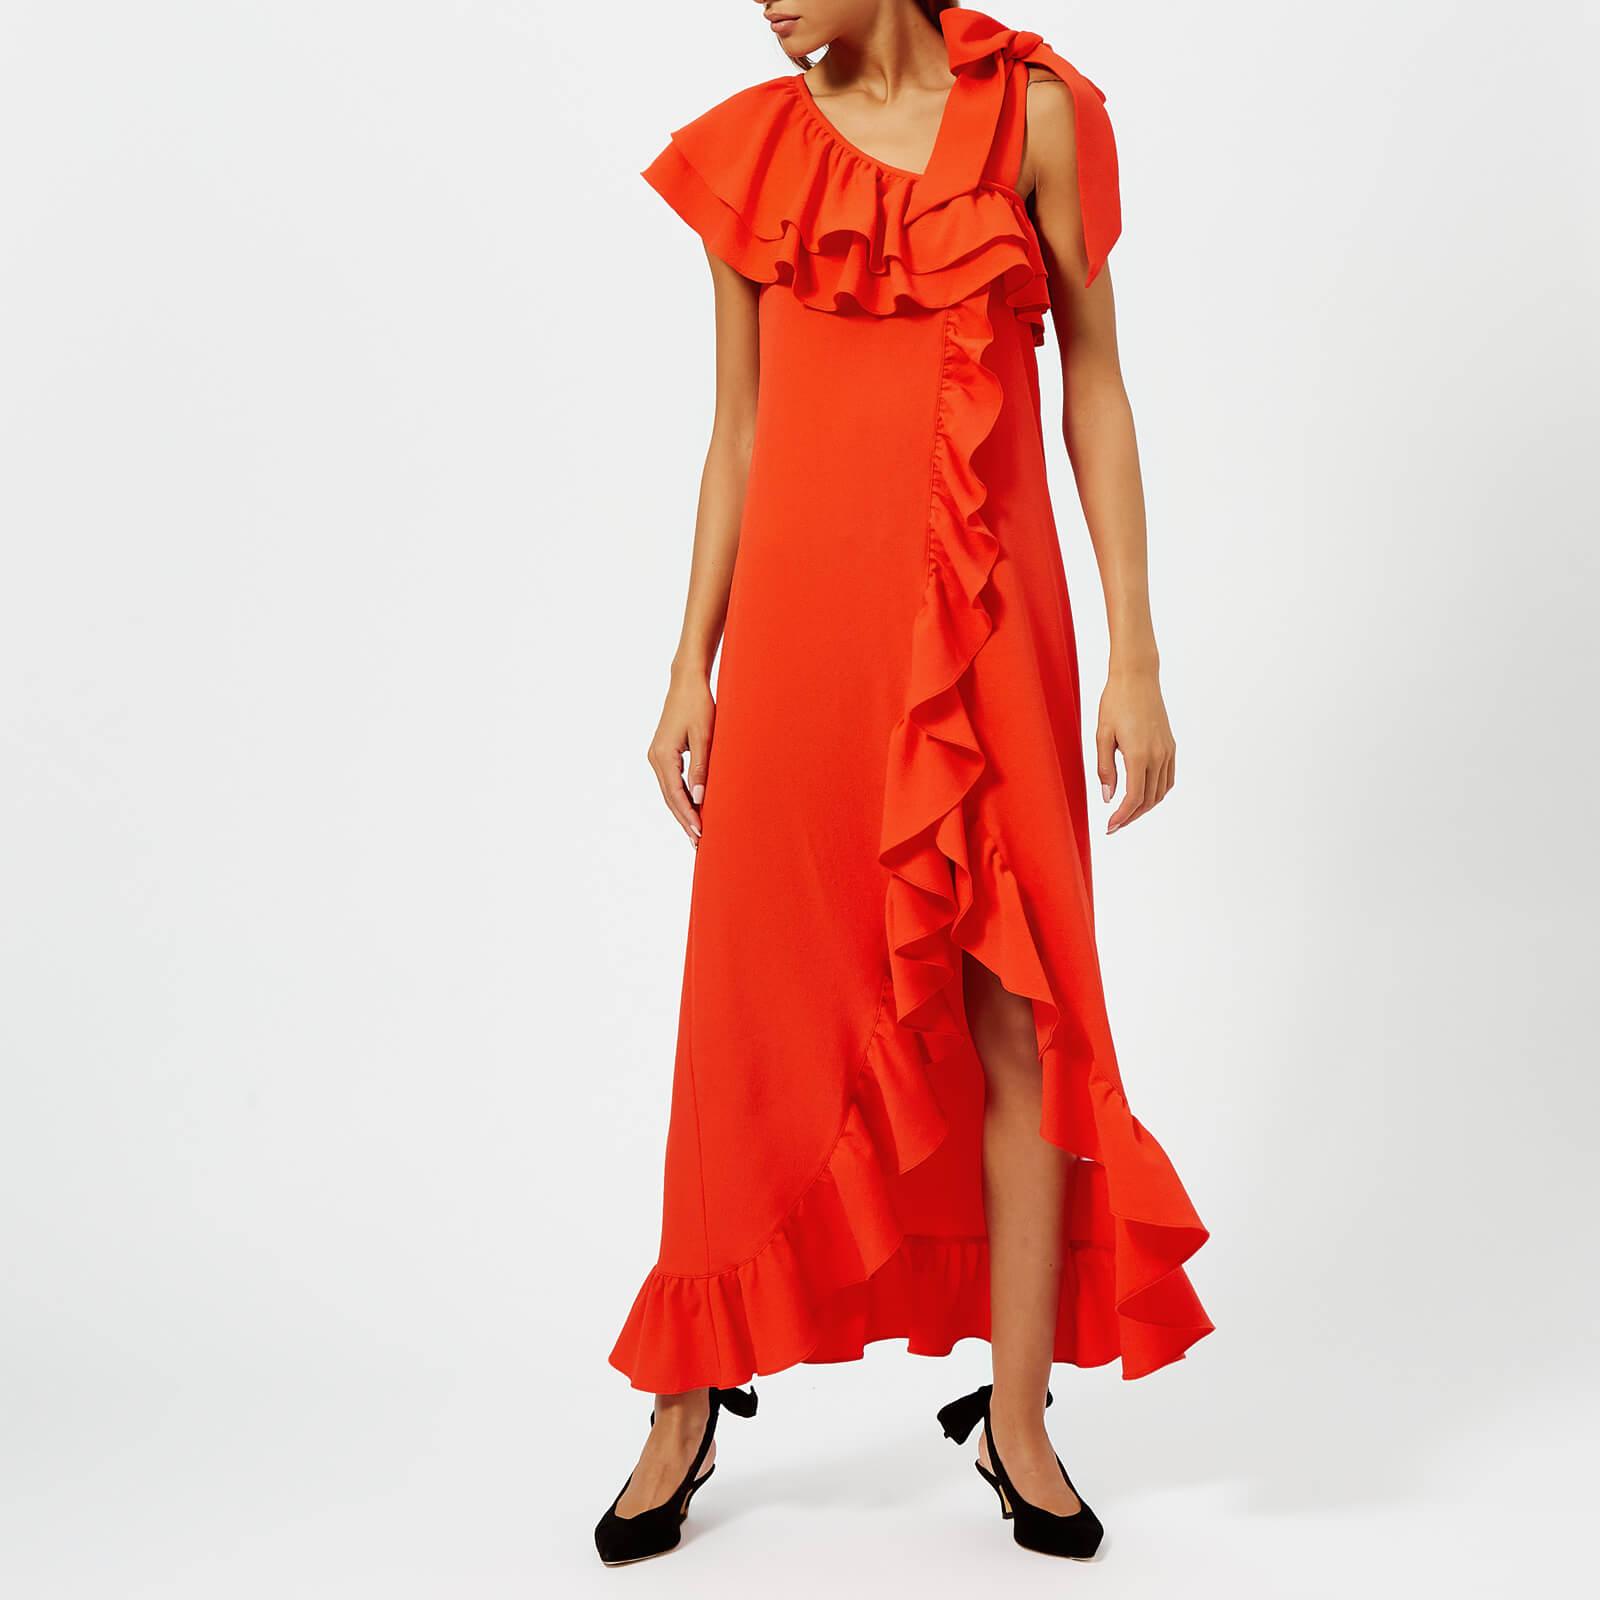 22e9411e59427 Ganni Women's Clark Dress - Big Apple Red - Free UK Delivery over £50